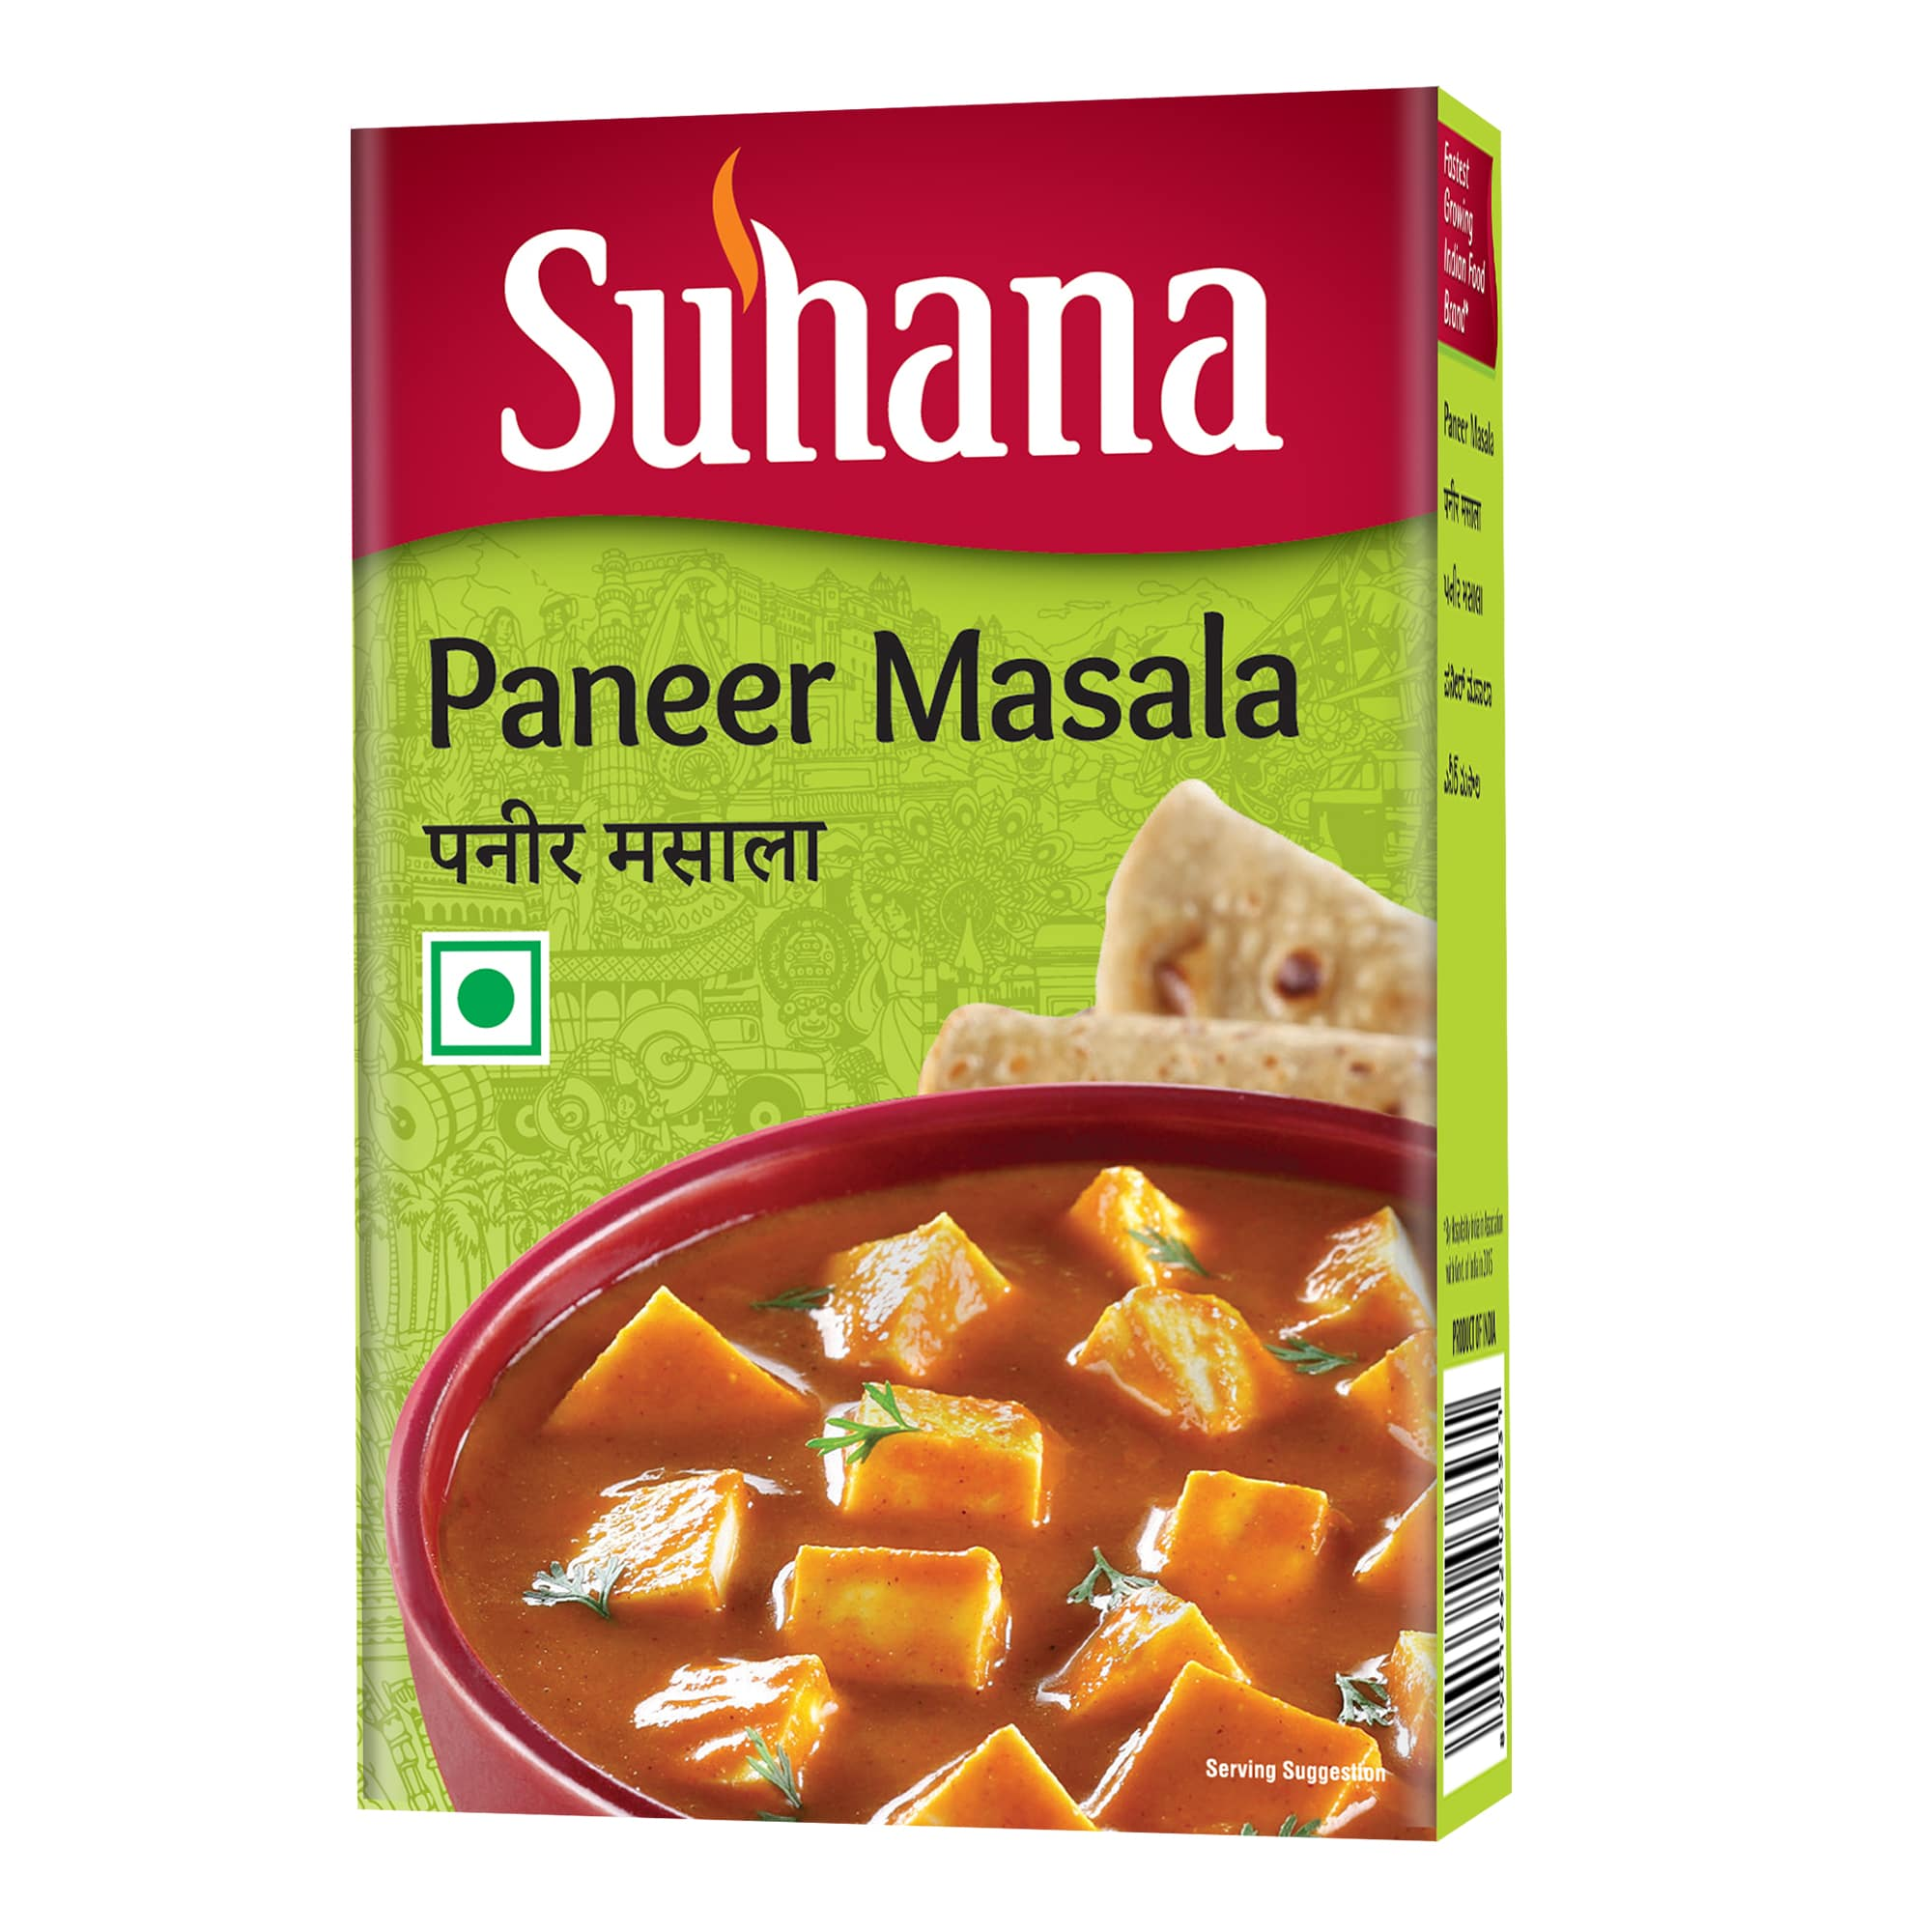 Suhana Paneer Masala 50g Box